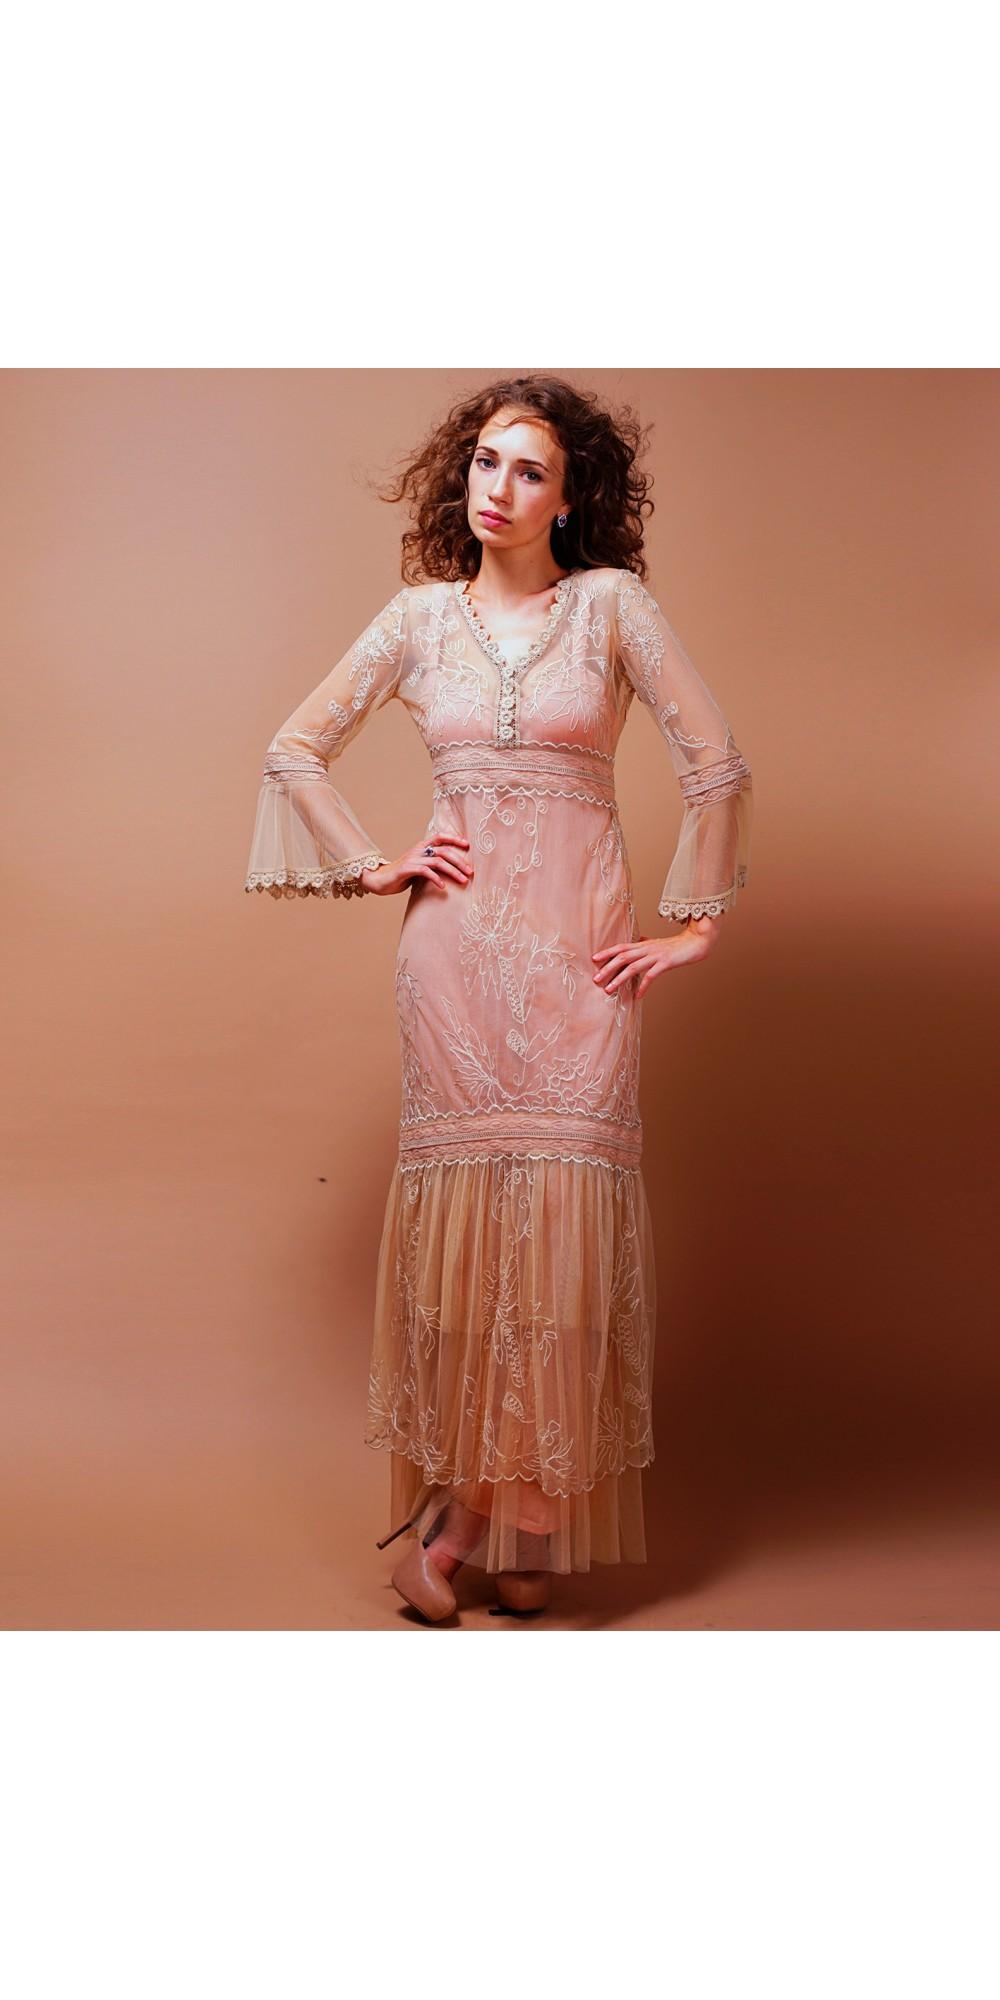 Titanic Empire Waist Wedding Dress in Pink-Champagne by Nataya